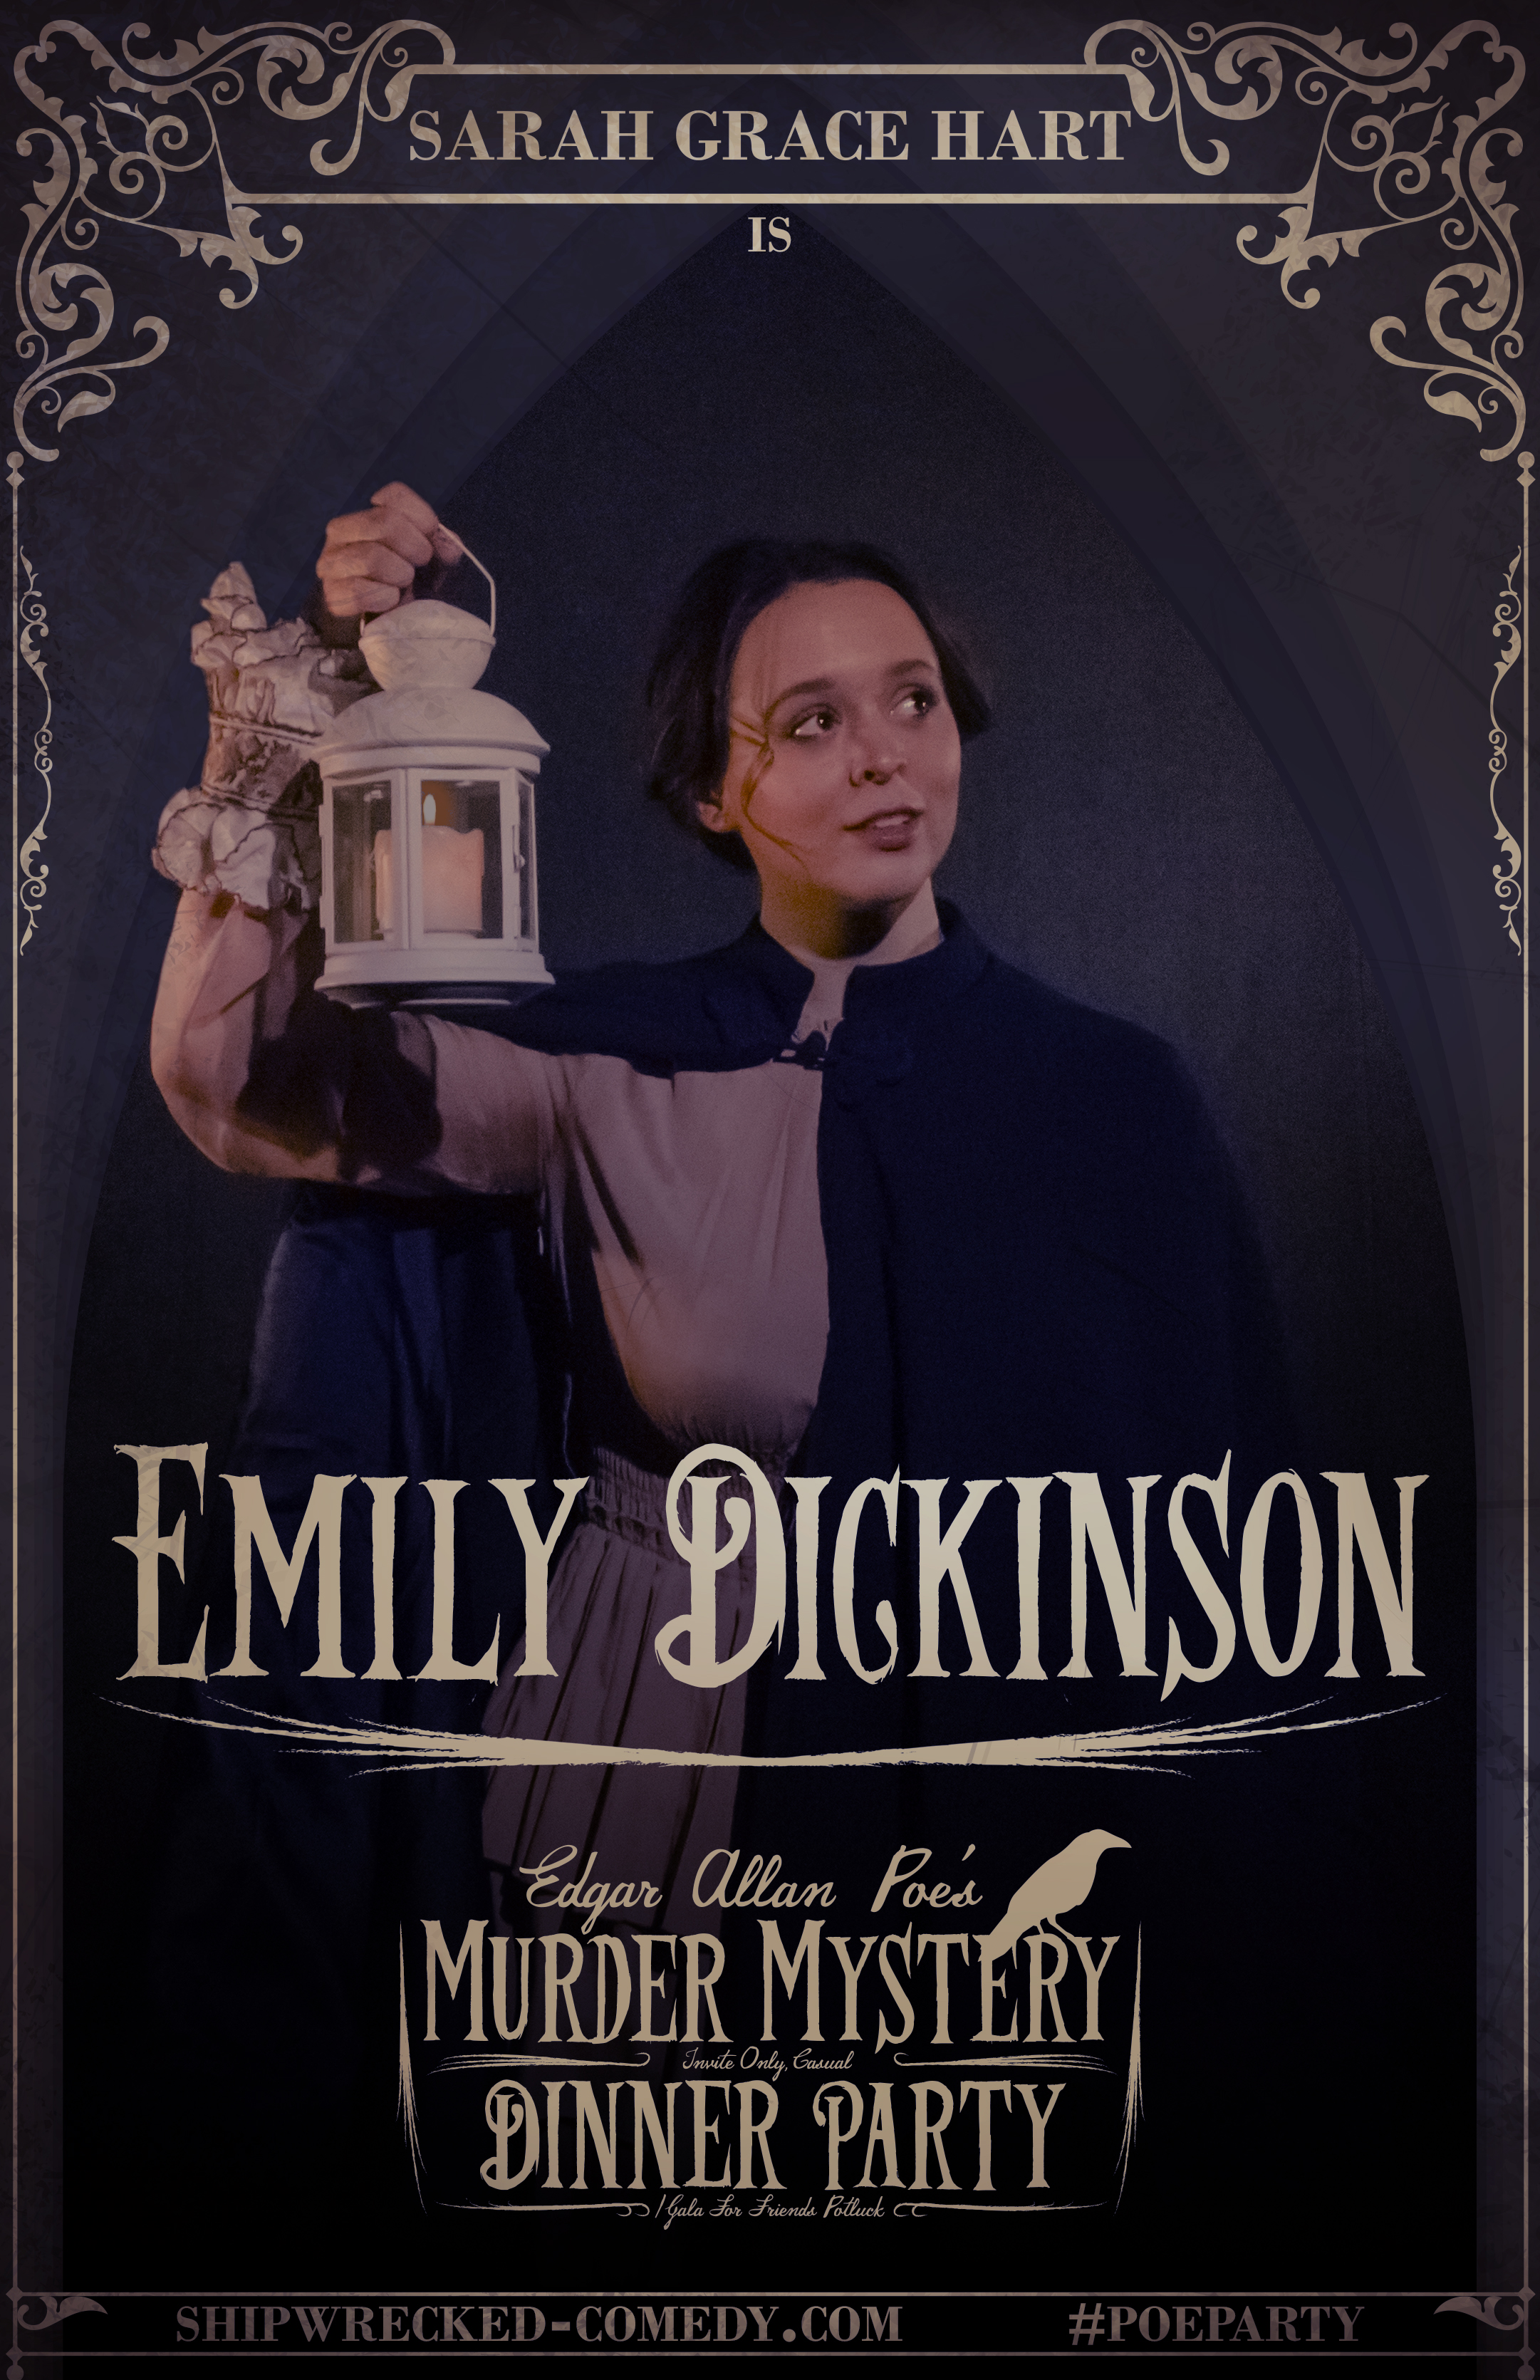 Sarah Grace Hart in Edgar Allan Poe's Murder Mystery Dinner Party (2016)